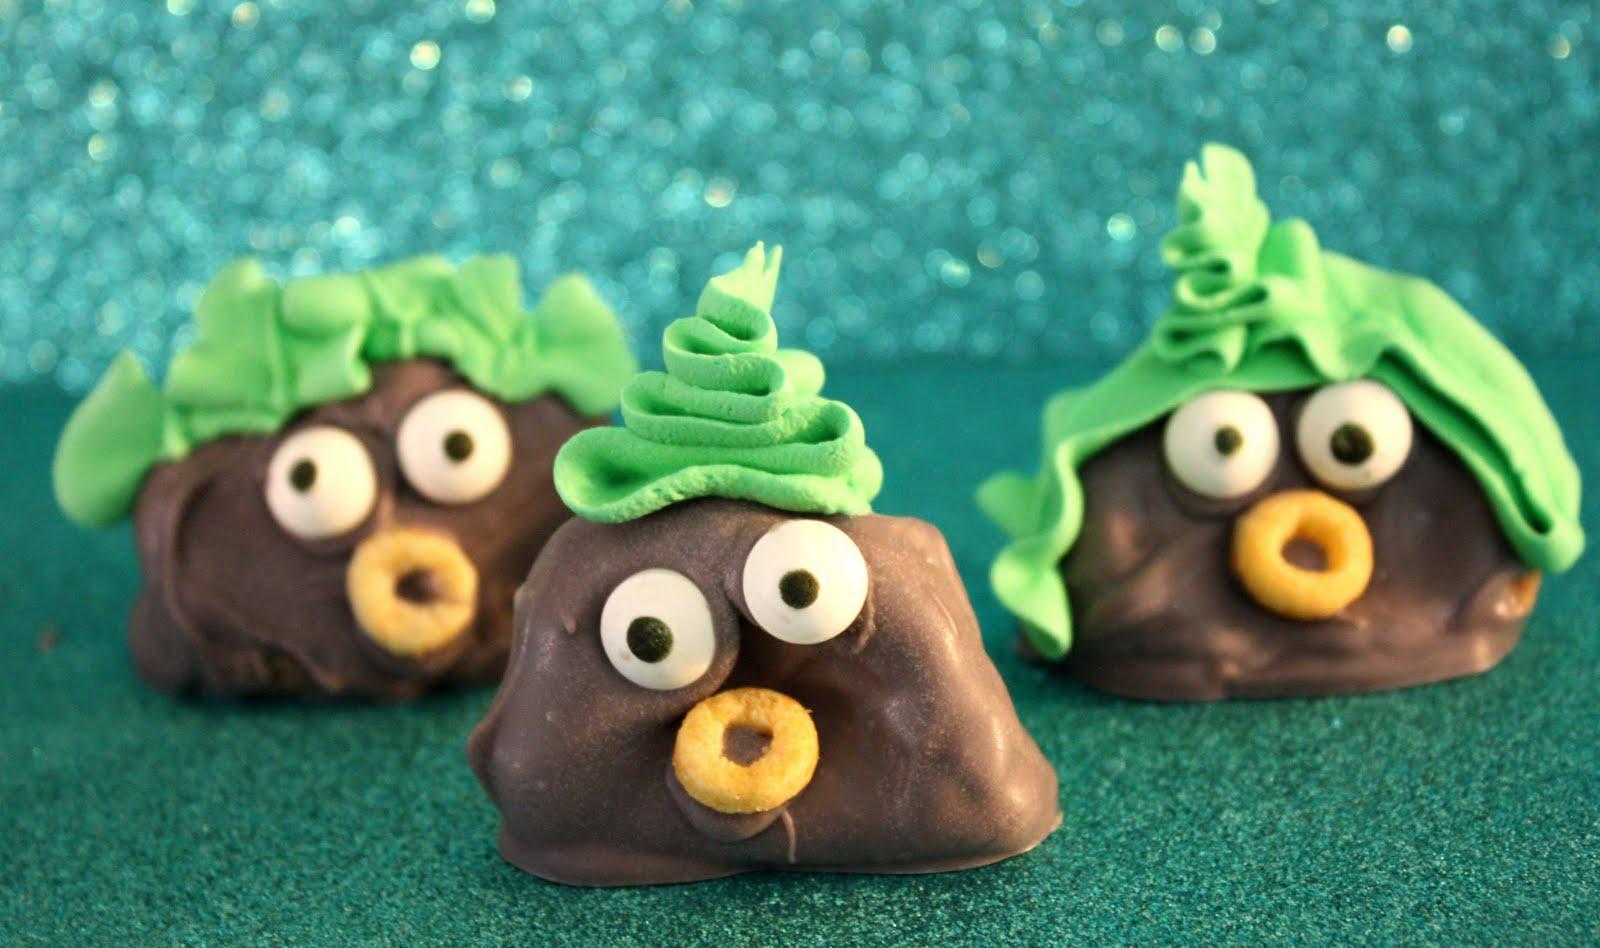 Edible Rock Star Cake Decorations